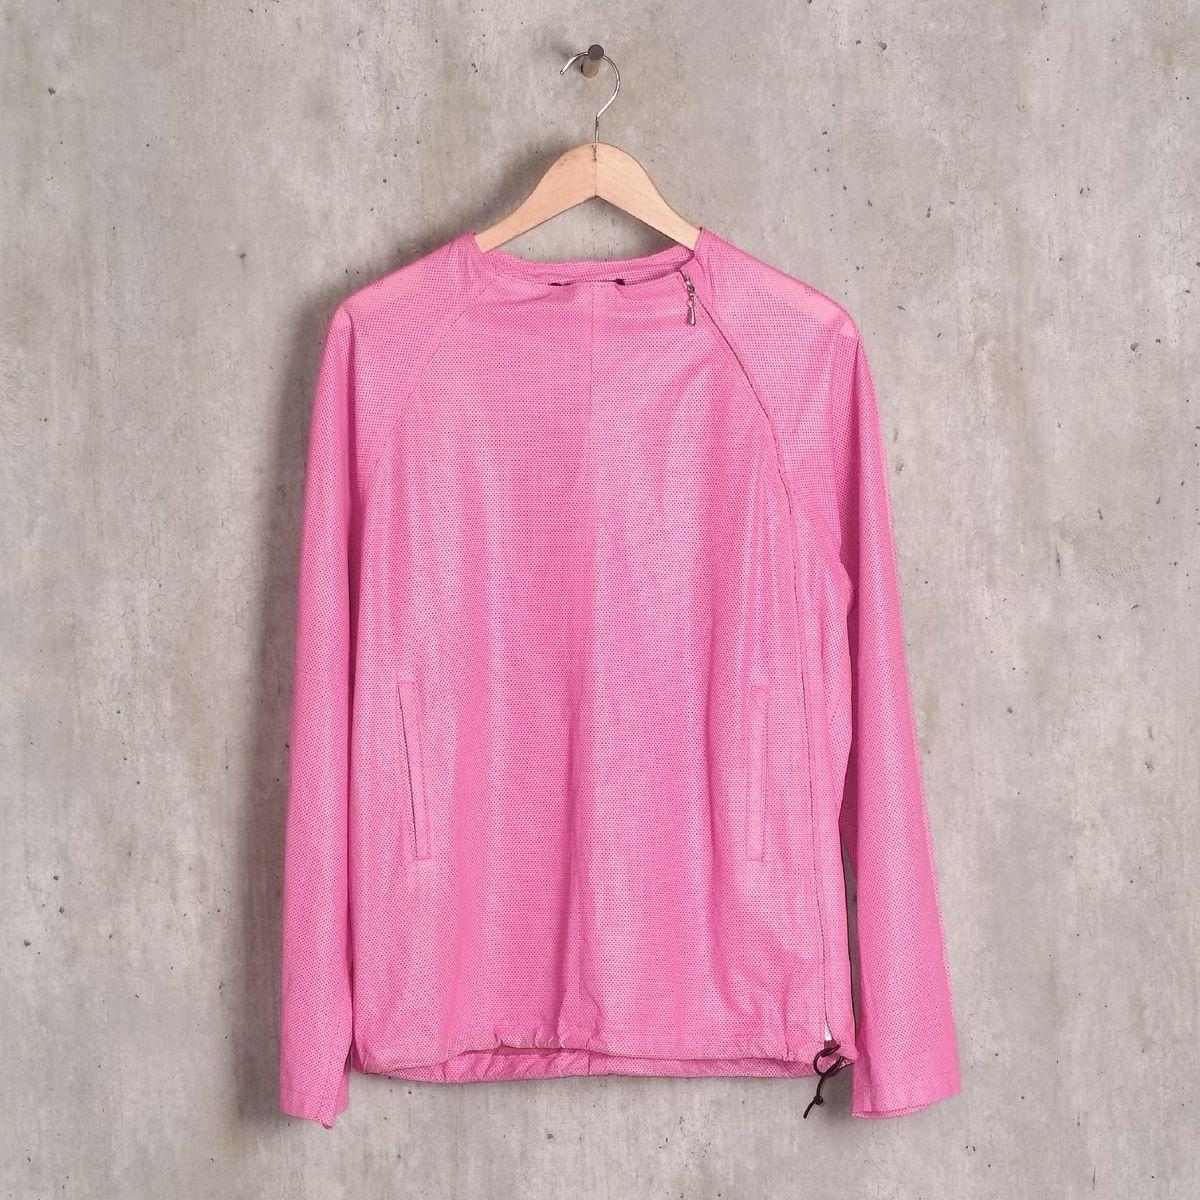 casaco rosa em couro gucci - casaquinhos gucci